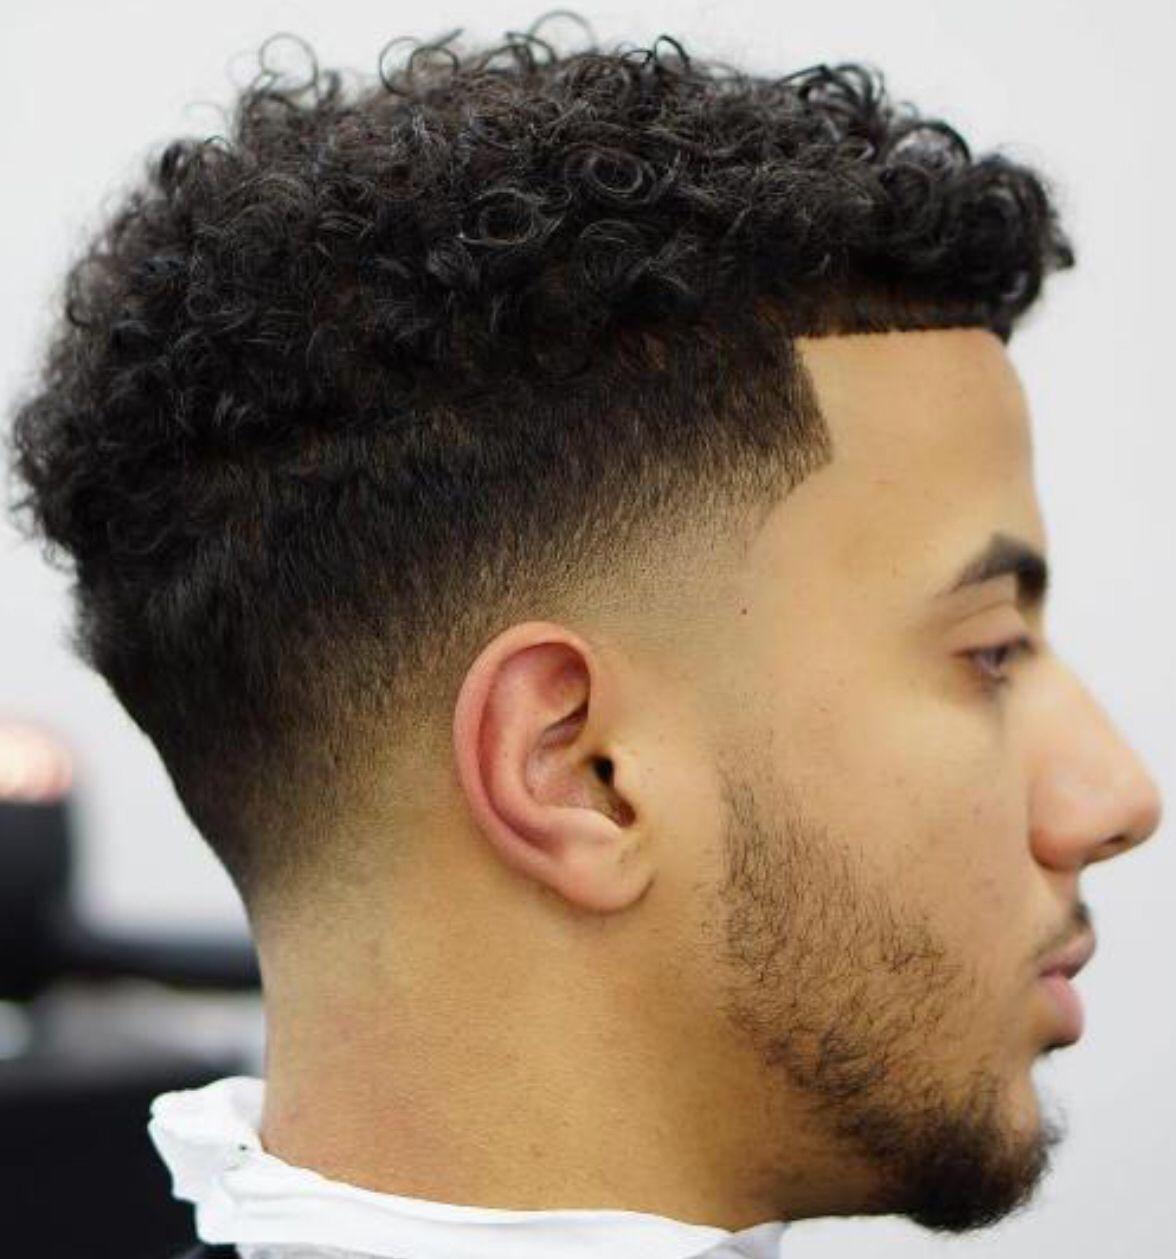 Baseline 2 Mens Haircuts Fade Fade Haircut Curly Hair Low Fade Haircut